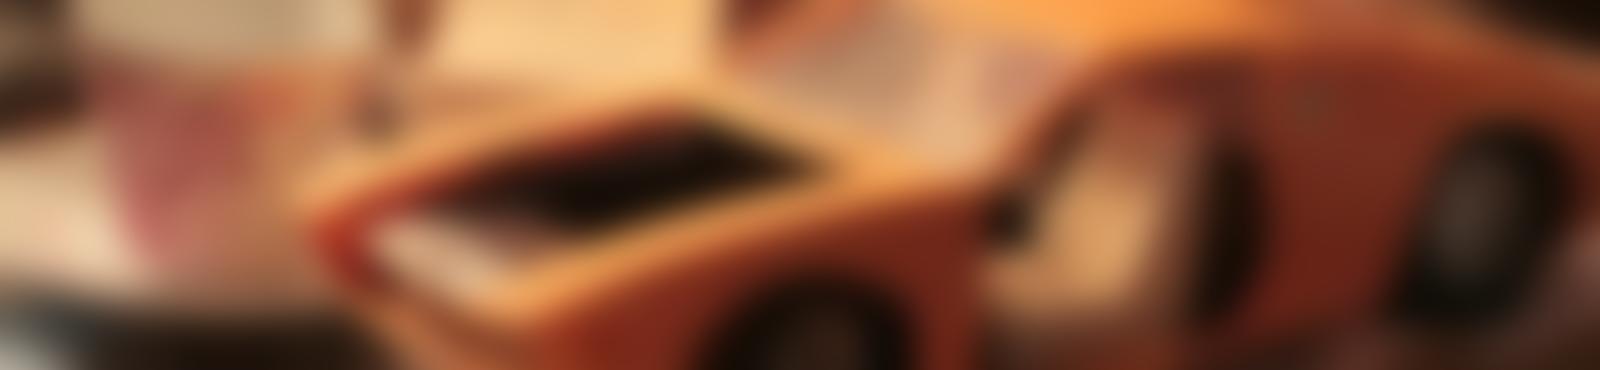 Blurred 6bd768f3 d42c 455e 85dc 50cce1209a0b